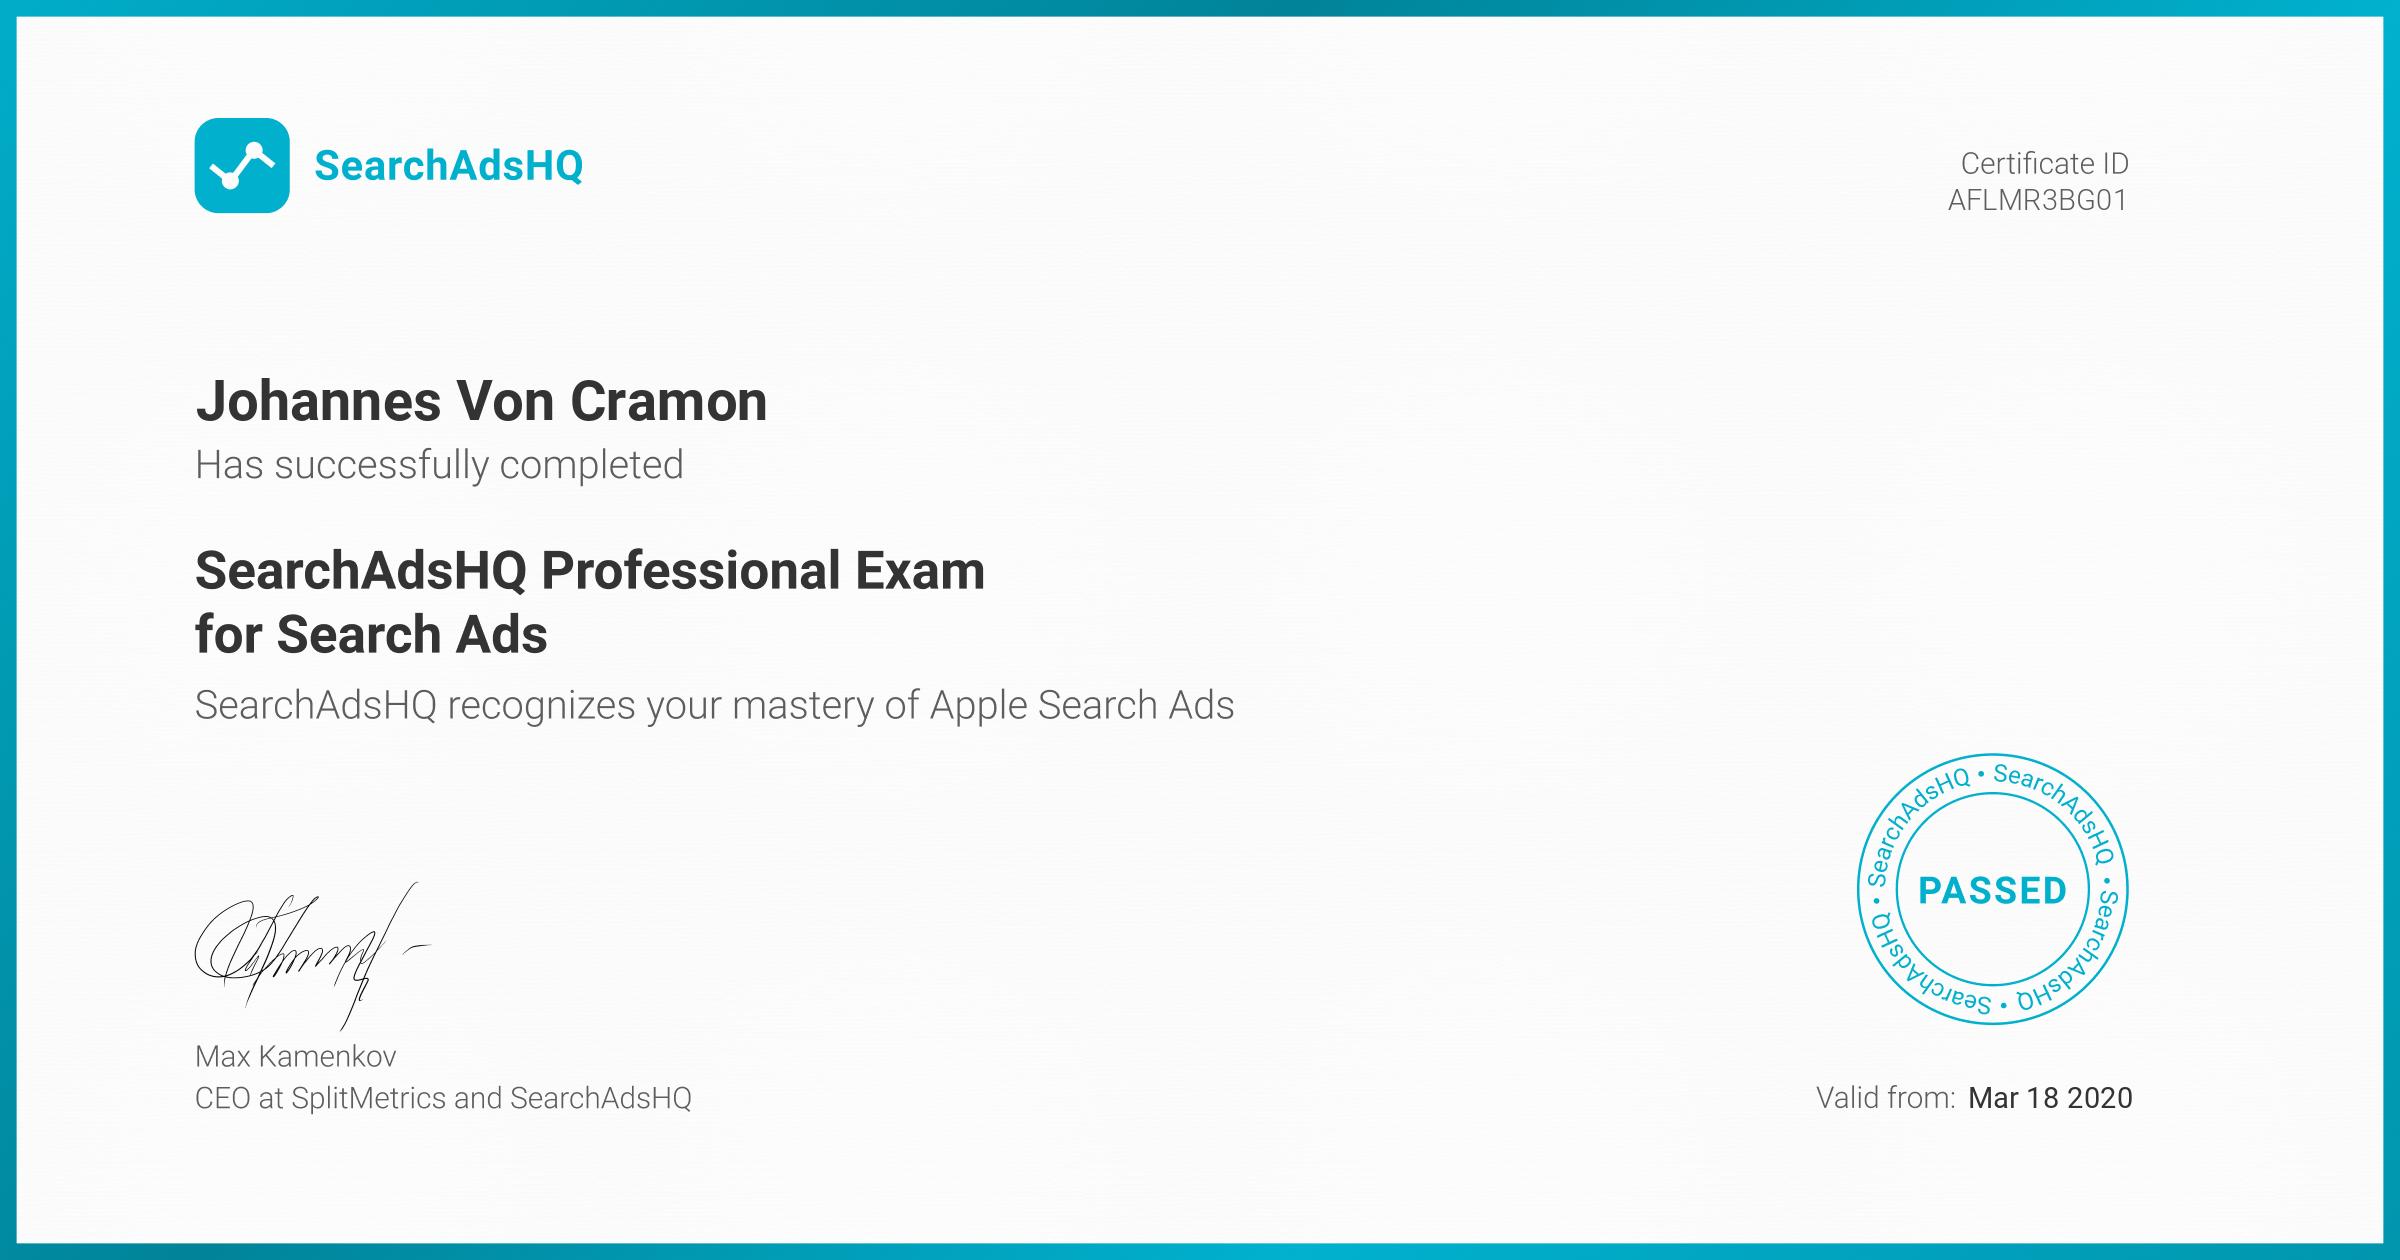 Certificate for Johannes Von Cramon | SearchAdsHQ Professional Exam for Search Ads